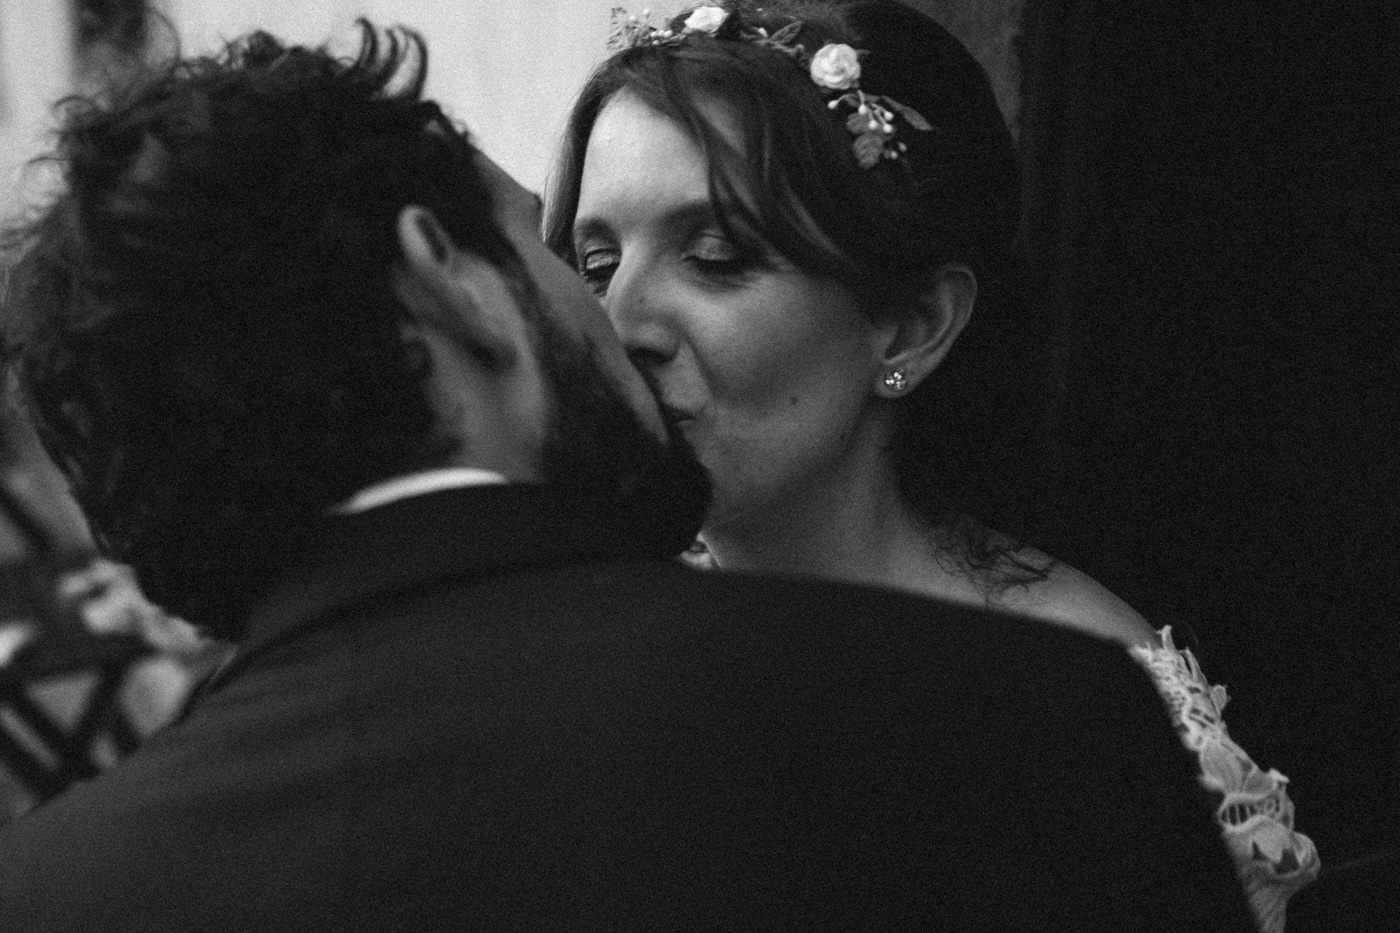 matrimoni_all_italiana_fotografo_matrimonio_toscana-84.jpg